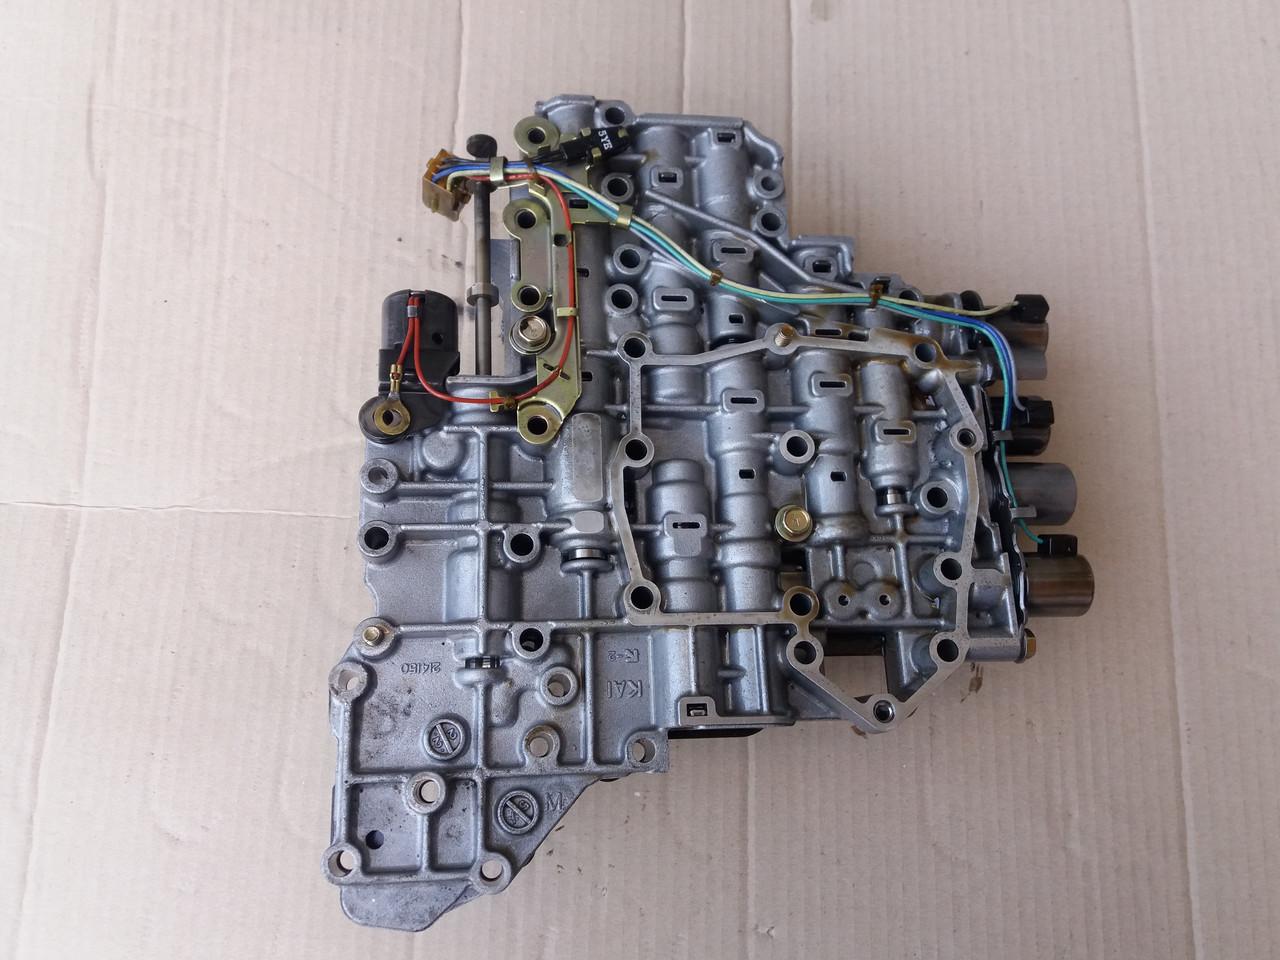 Блок соленоїдів Nissan Teana J31 Nissan Maxima A33 X-Trail T30 3194085X05 3194085X0B